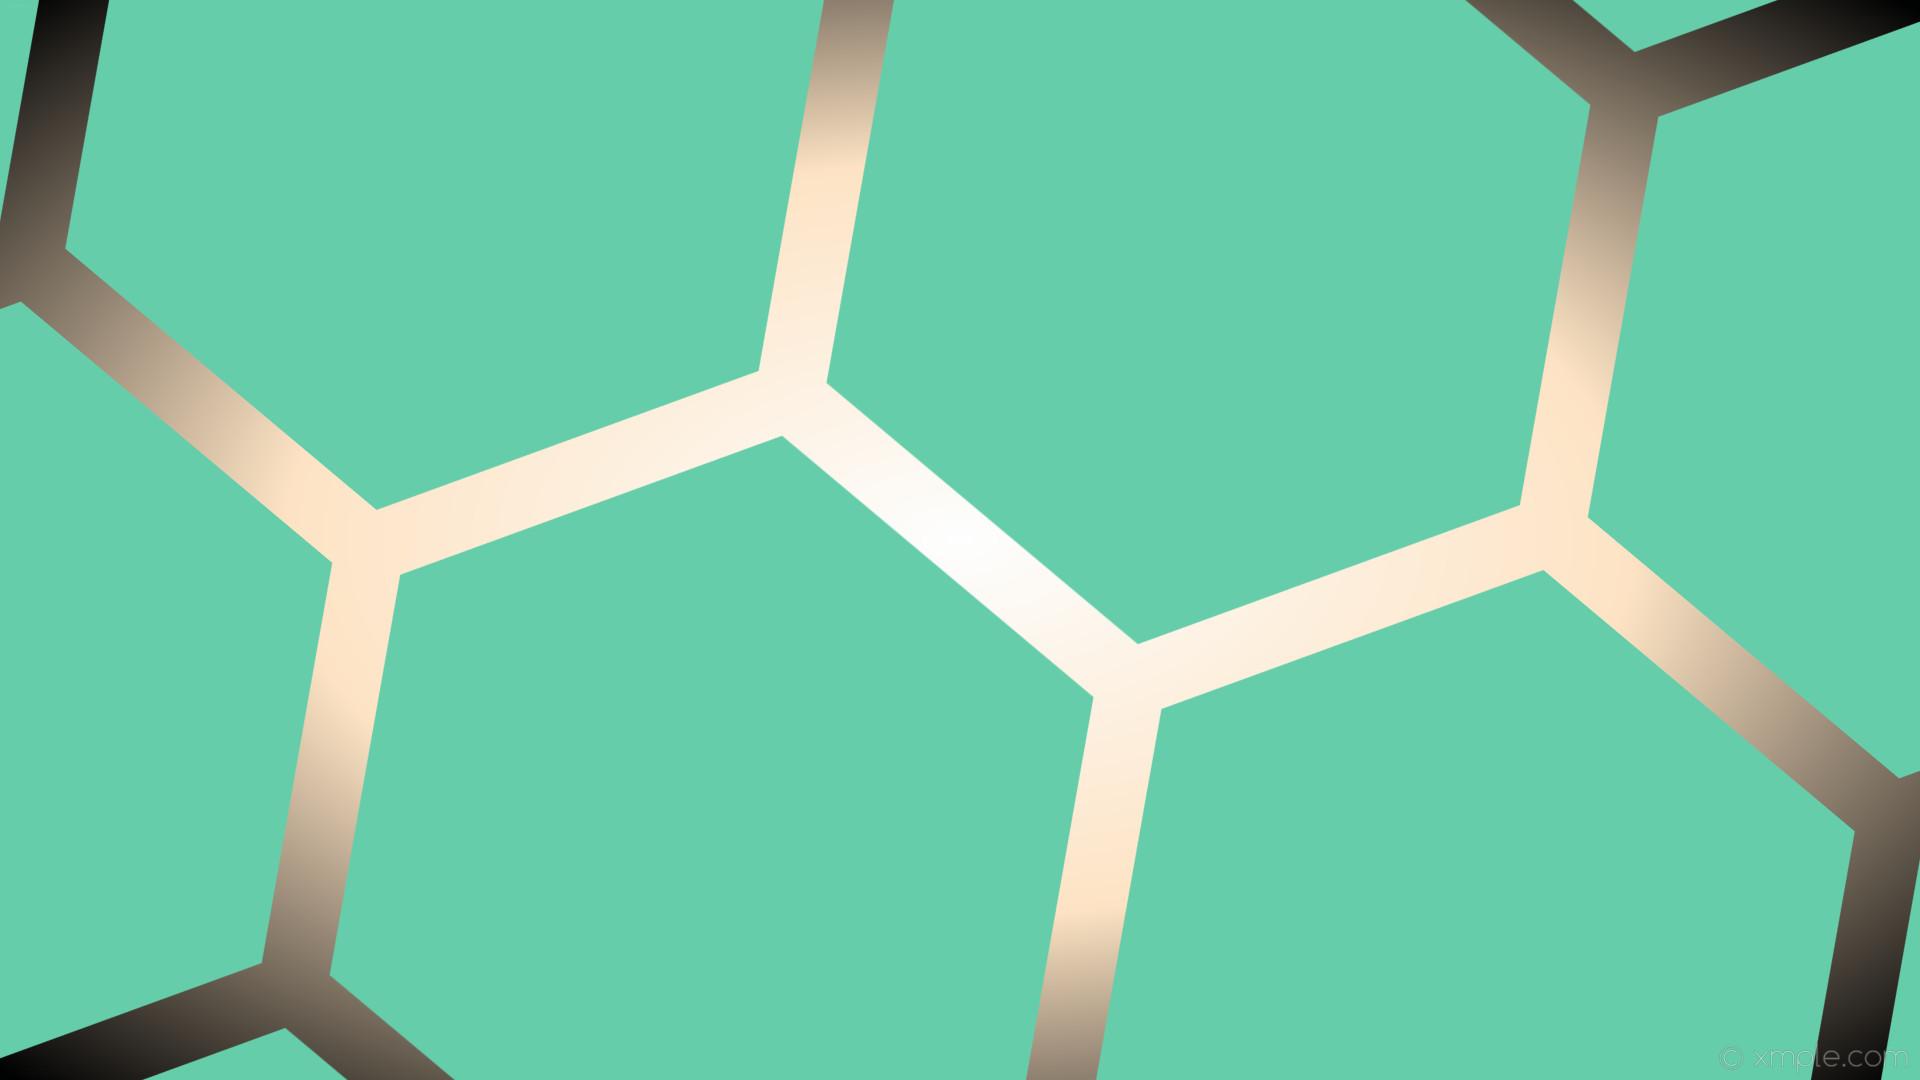 Res: 1920x1080, wallpaper hexagon white black green glow gradient brown medium aquamarine  bisque #66cdaa #ffffff #